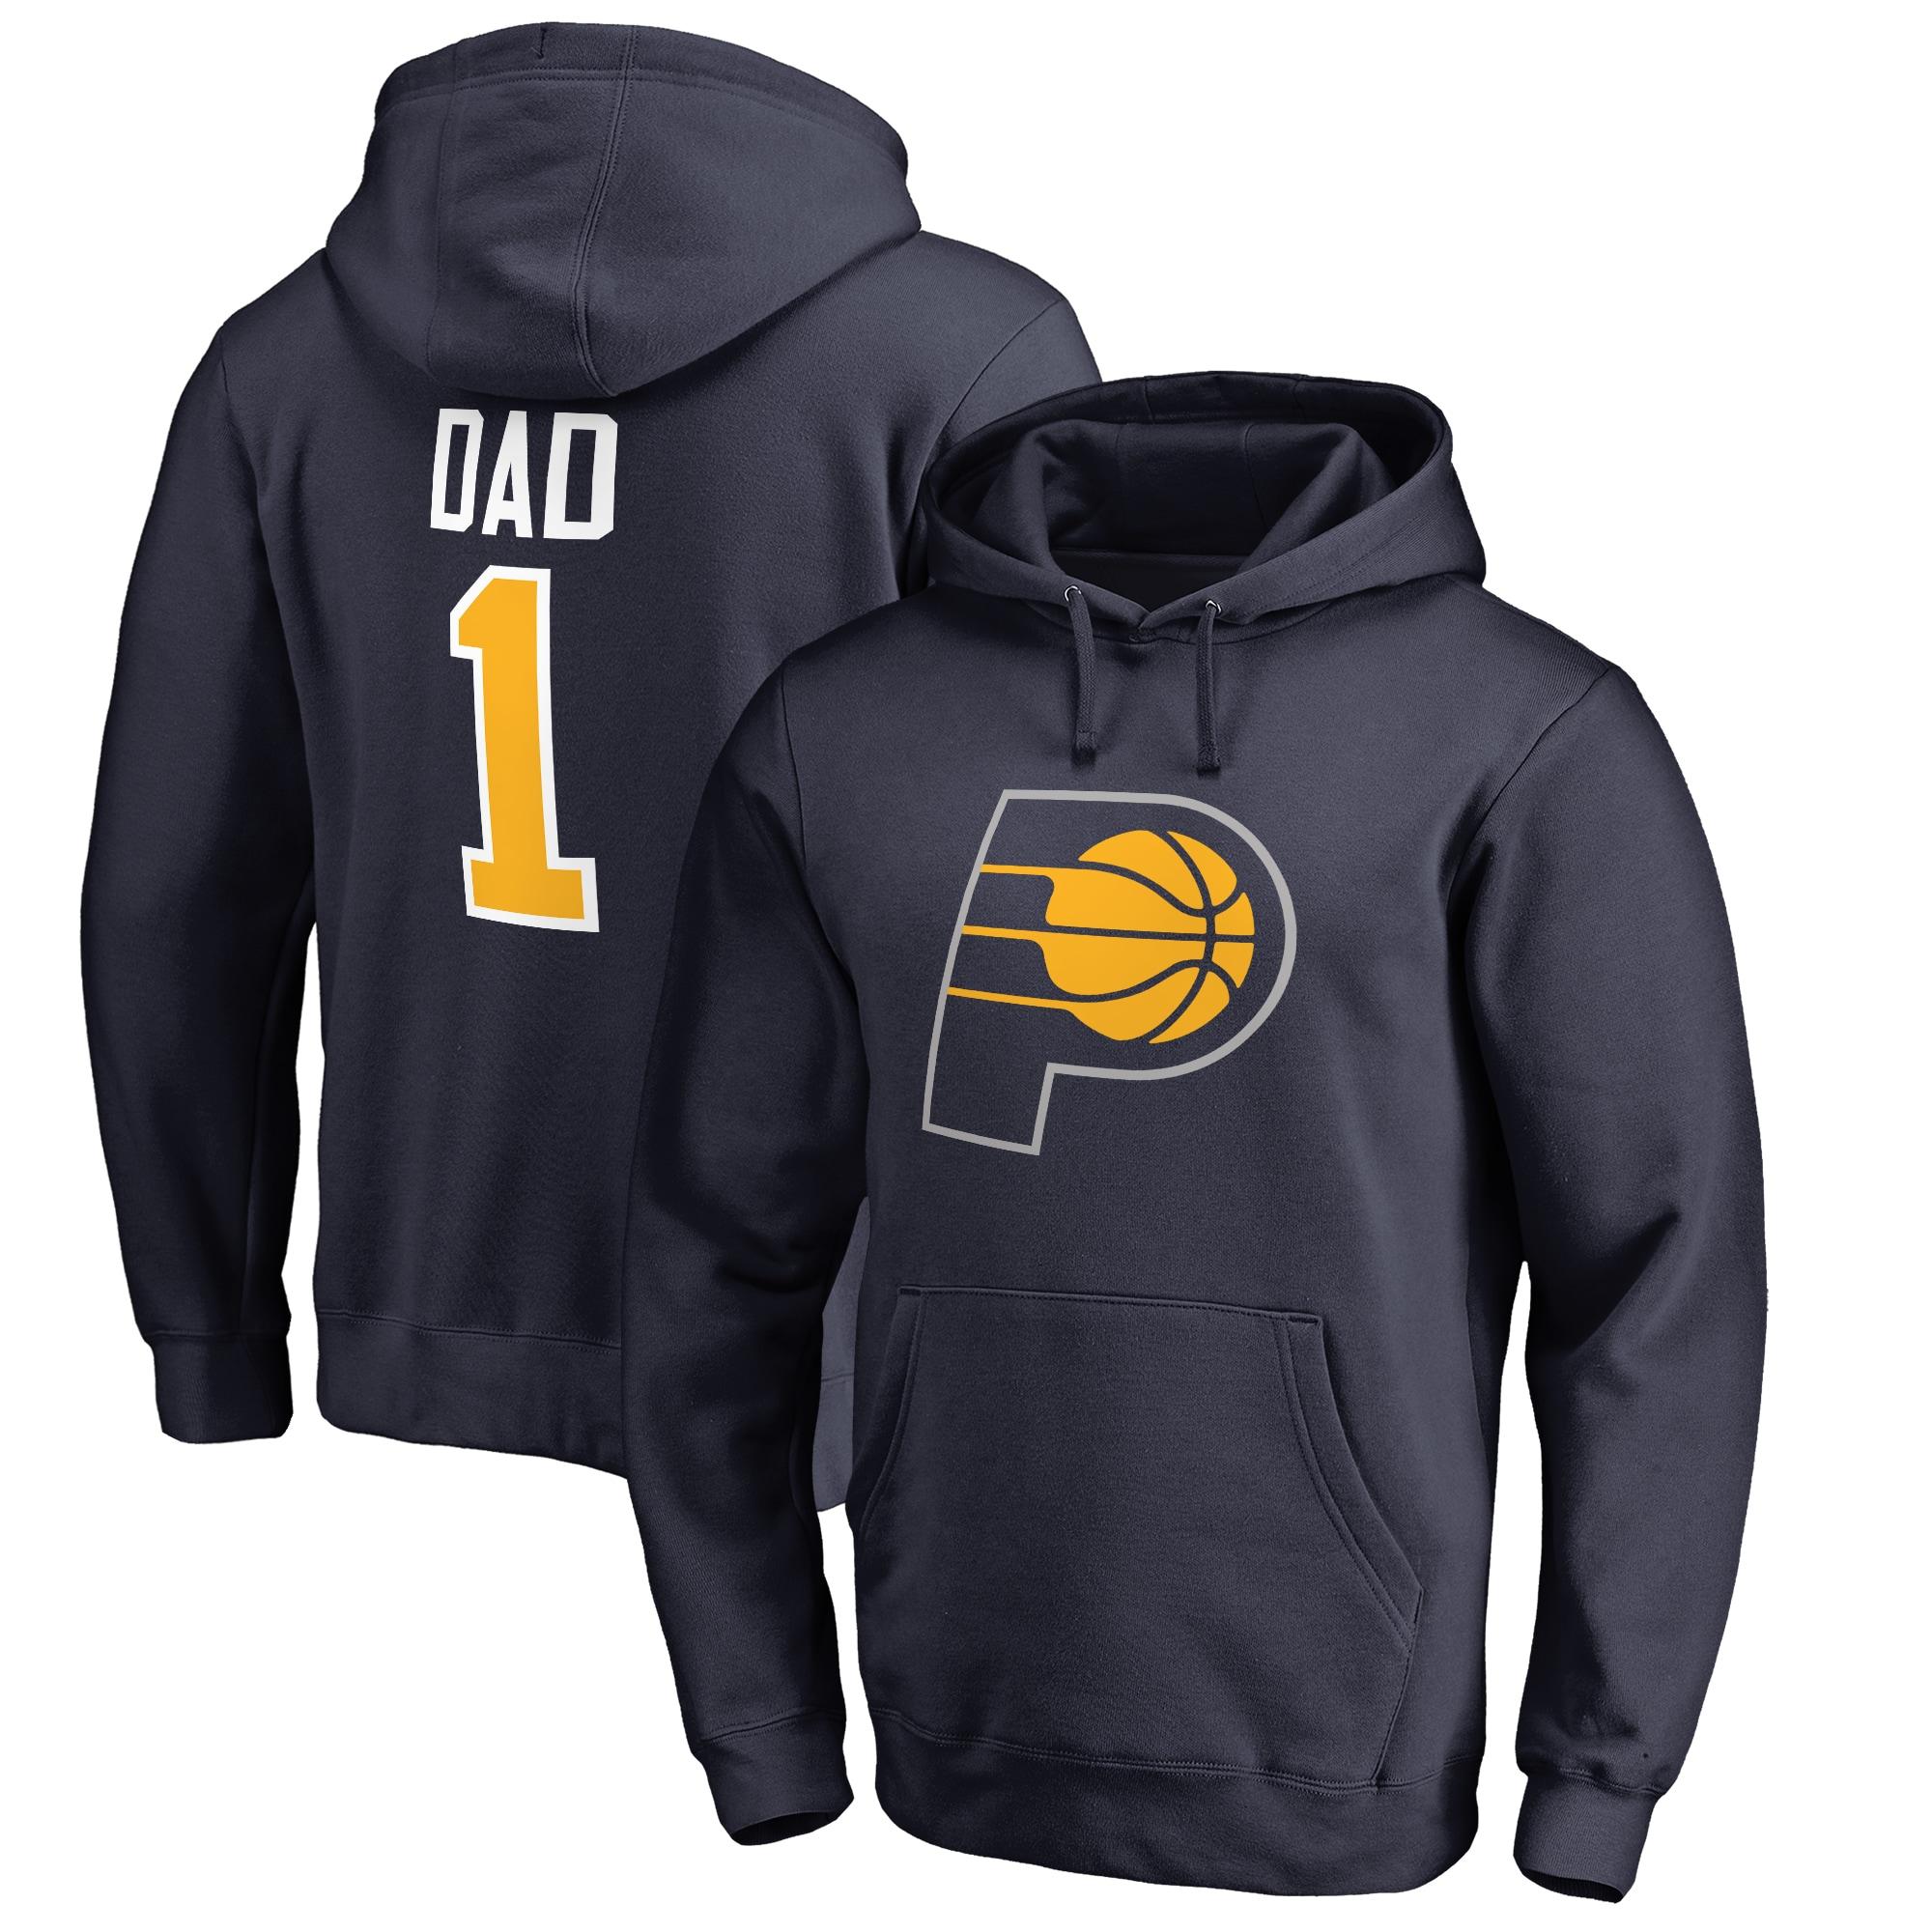 Indiana Pacers #1 Dad Pullover Hoodie - Navy